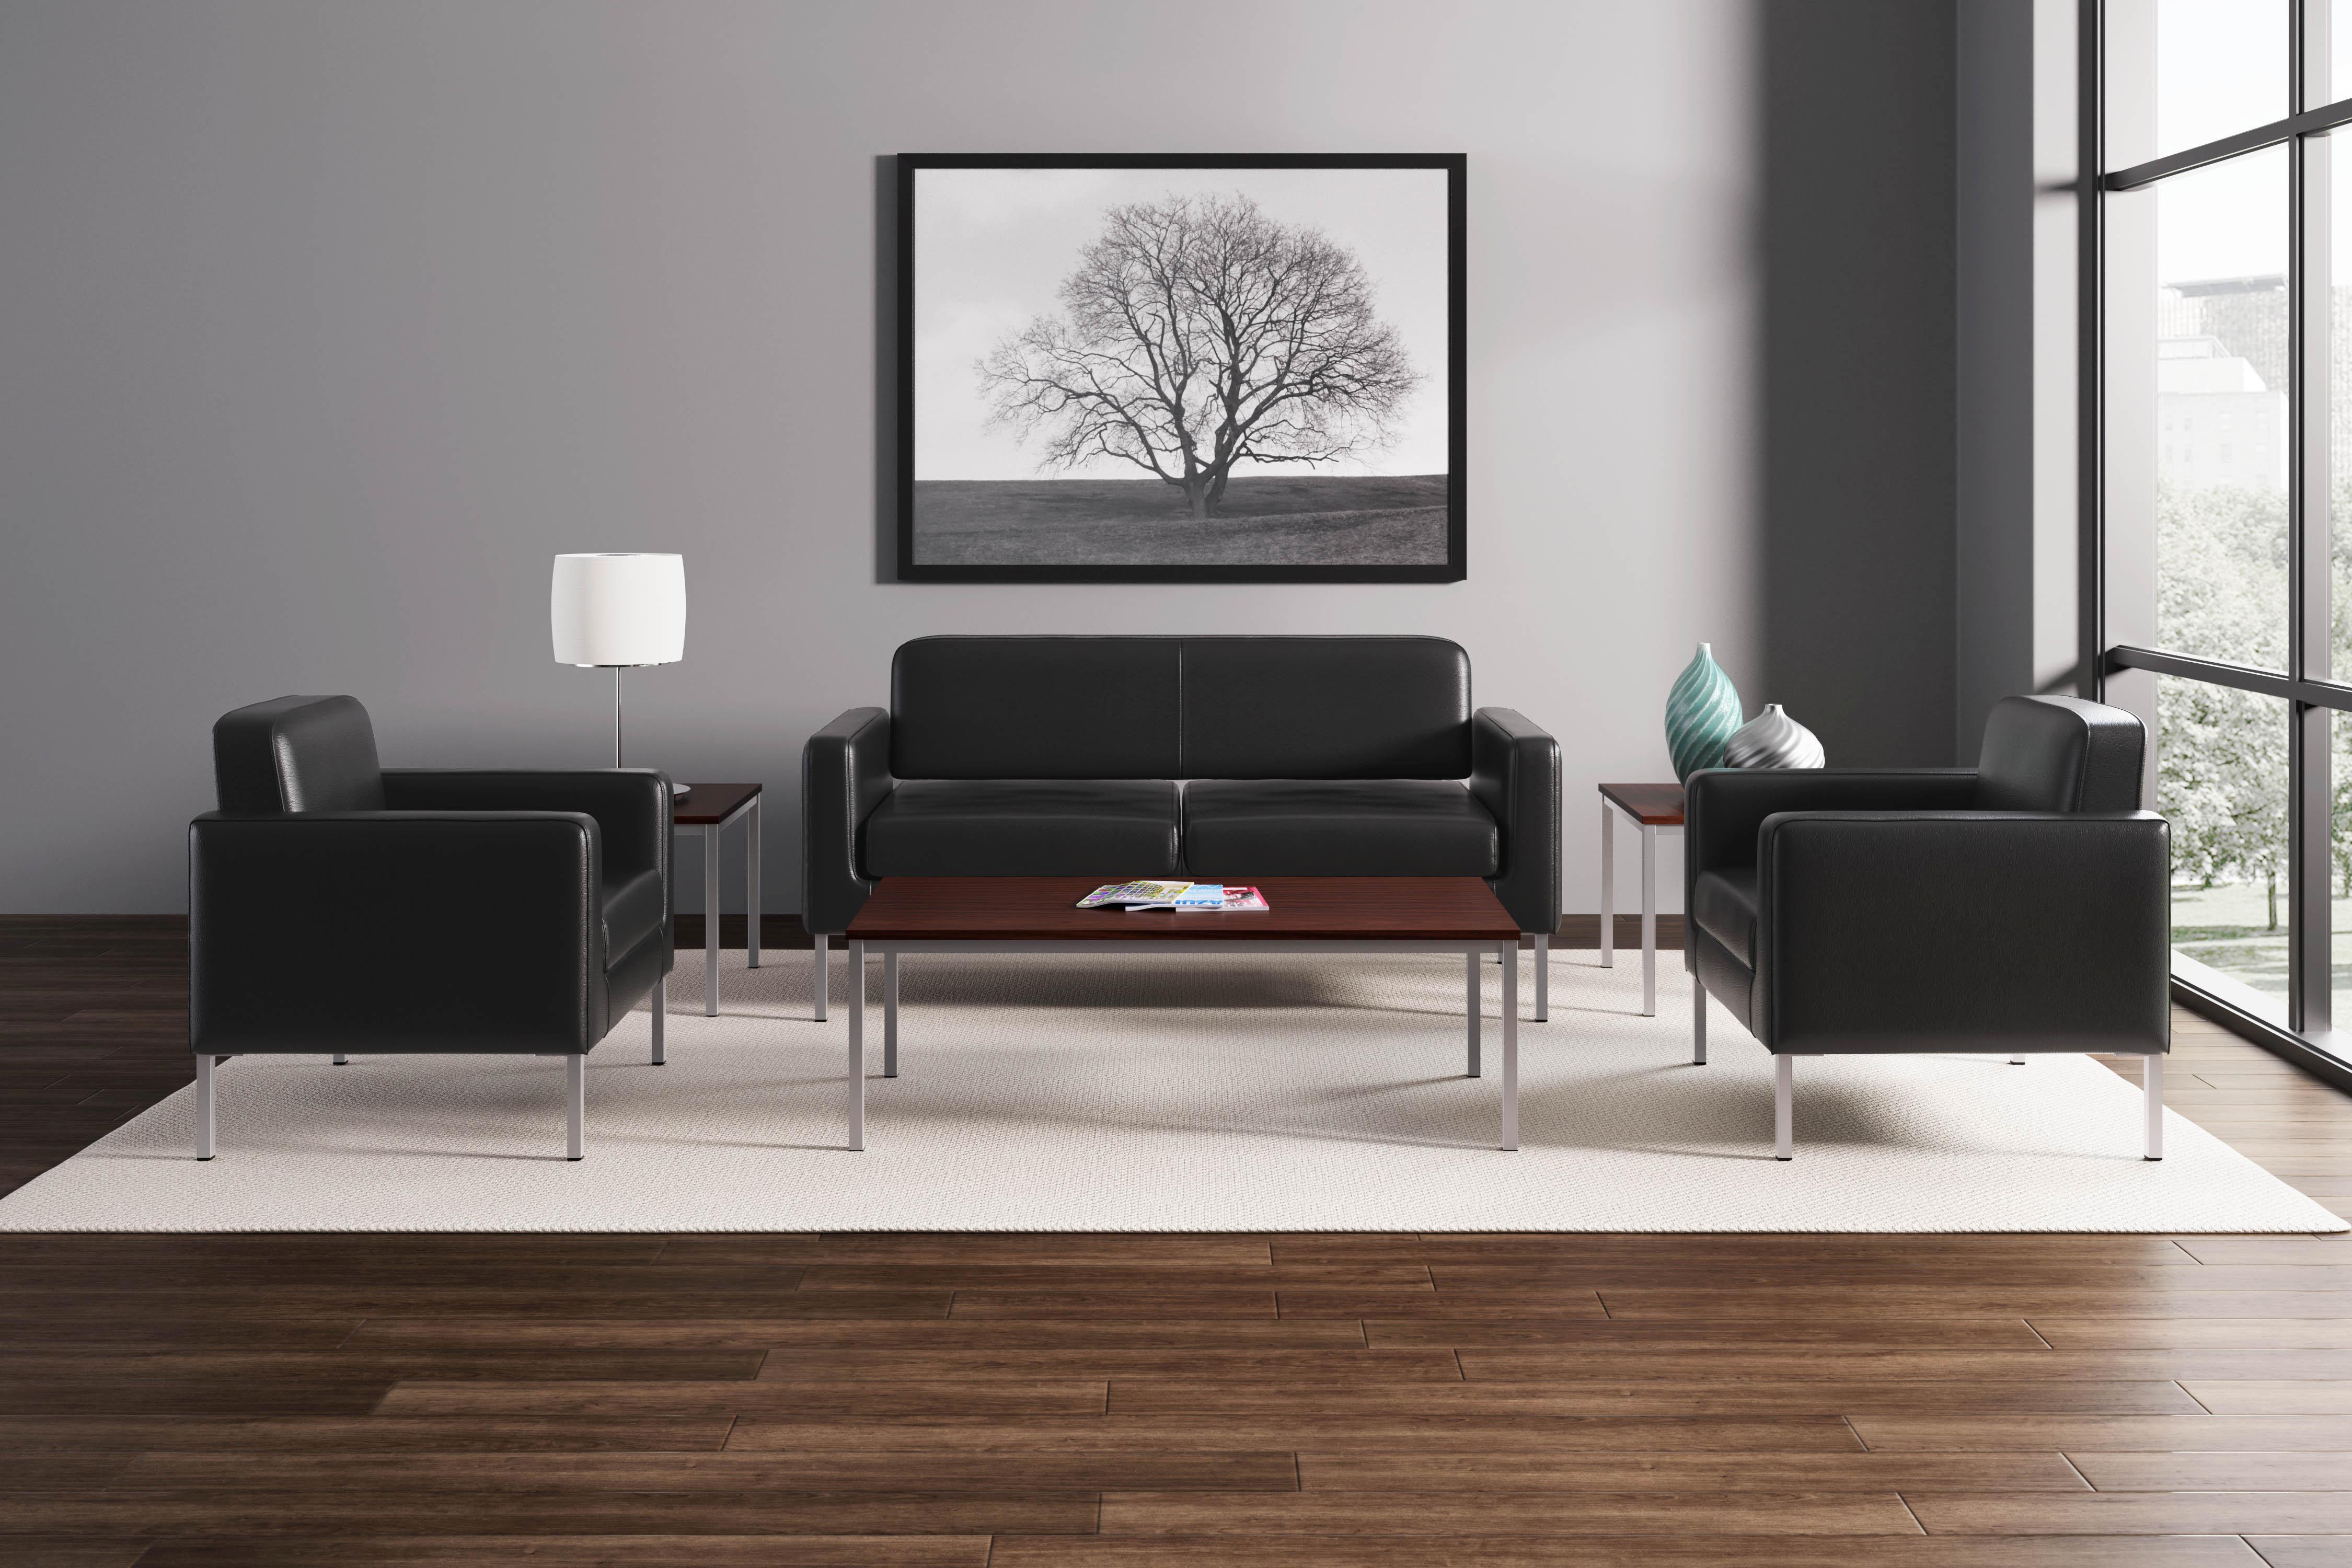 Popular L Shaped Sofa Cover-Buy Cheap L Shaped Sofa Cover